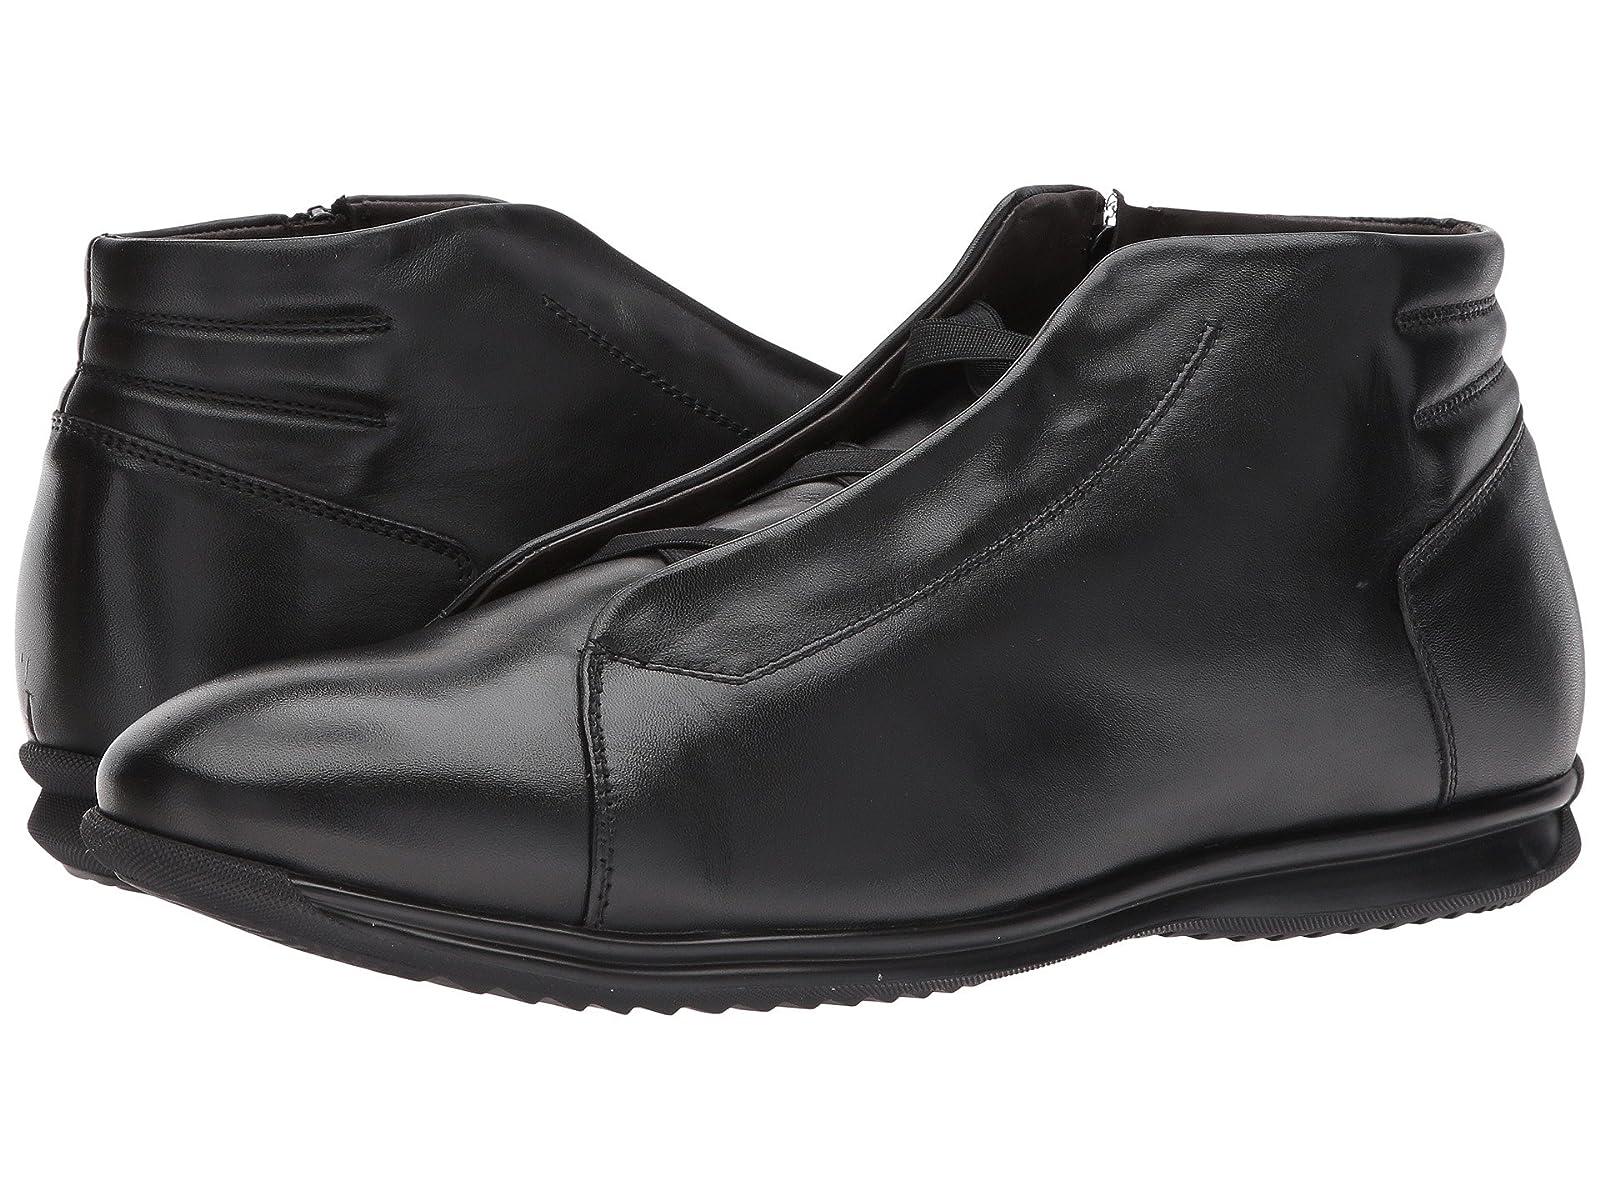 Bacco Bucci KikoSelling fashionable and eye-catching shoes